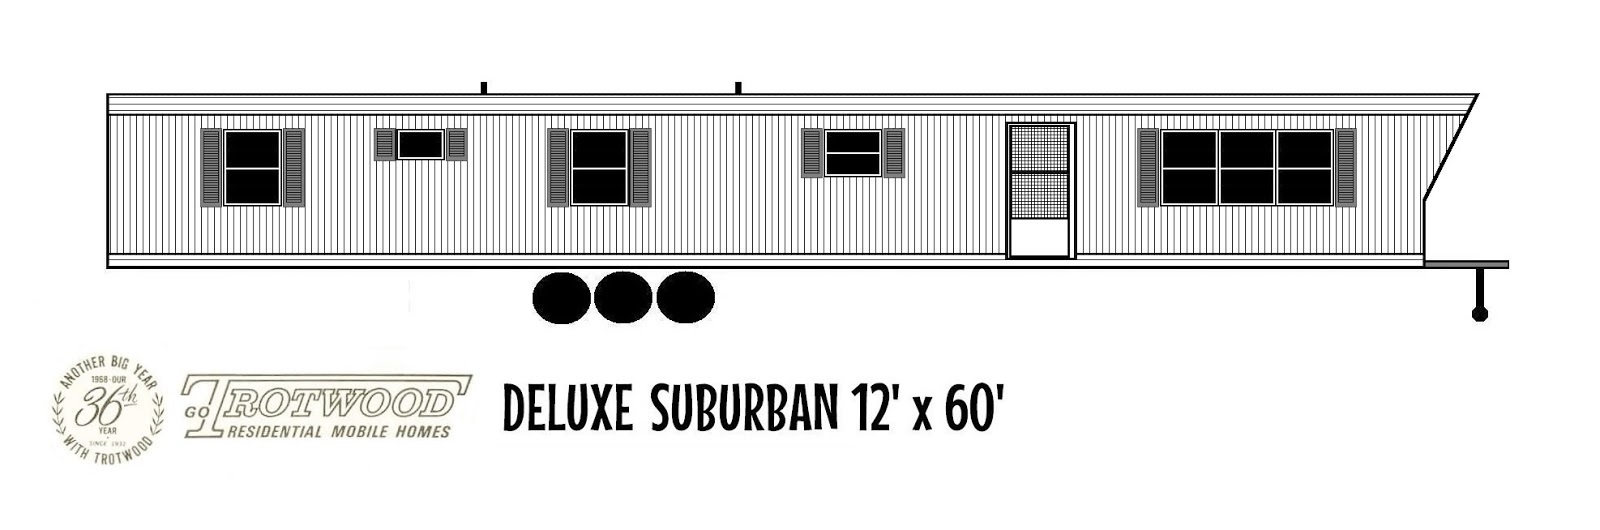 Portable Levittown  1968 Models